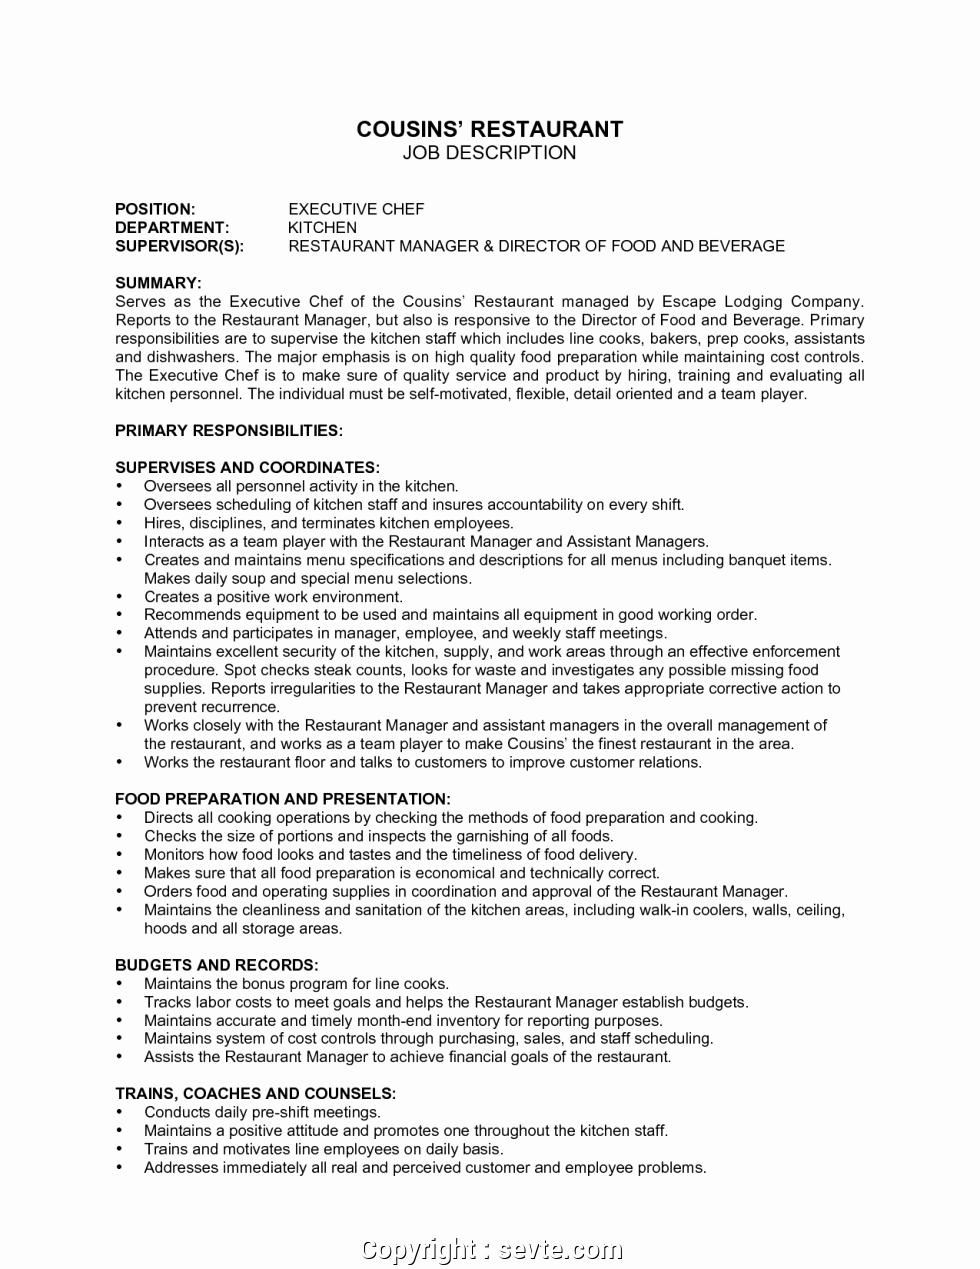 Job Description for Hostess Inspirational Simple Restaurant Description Sample 9 Hostess Job